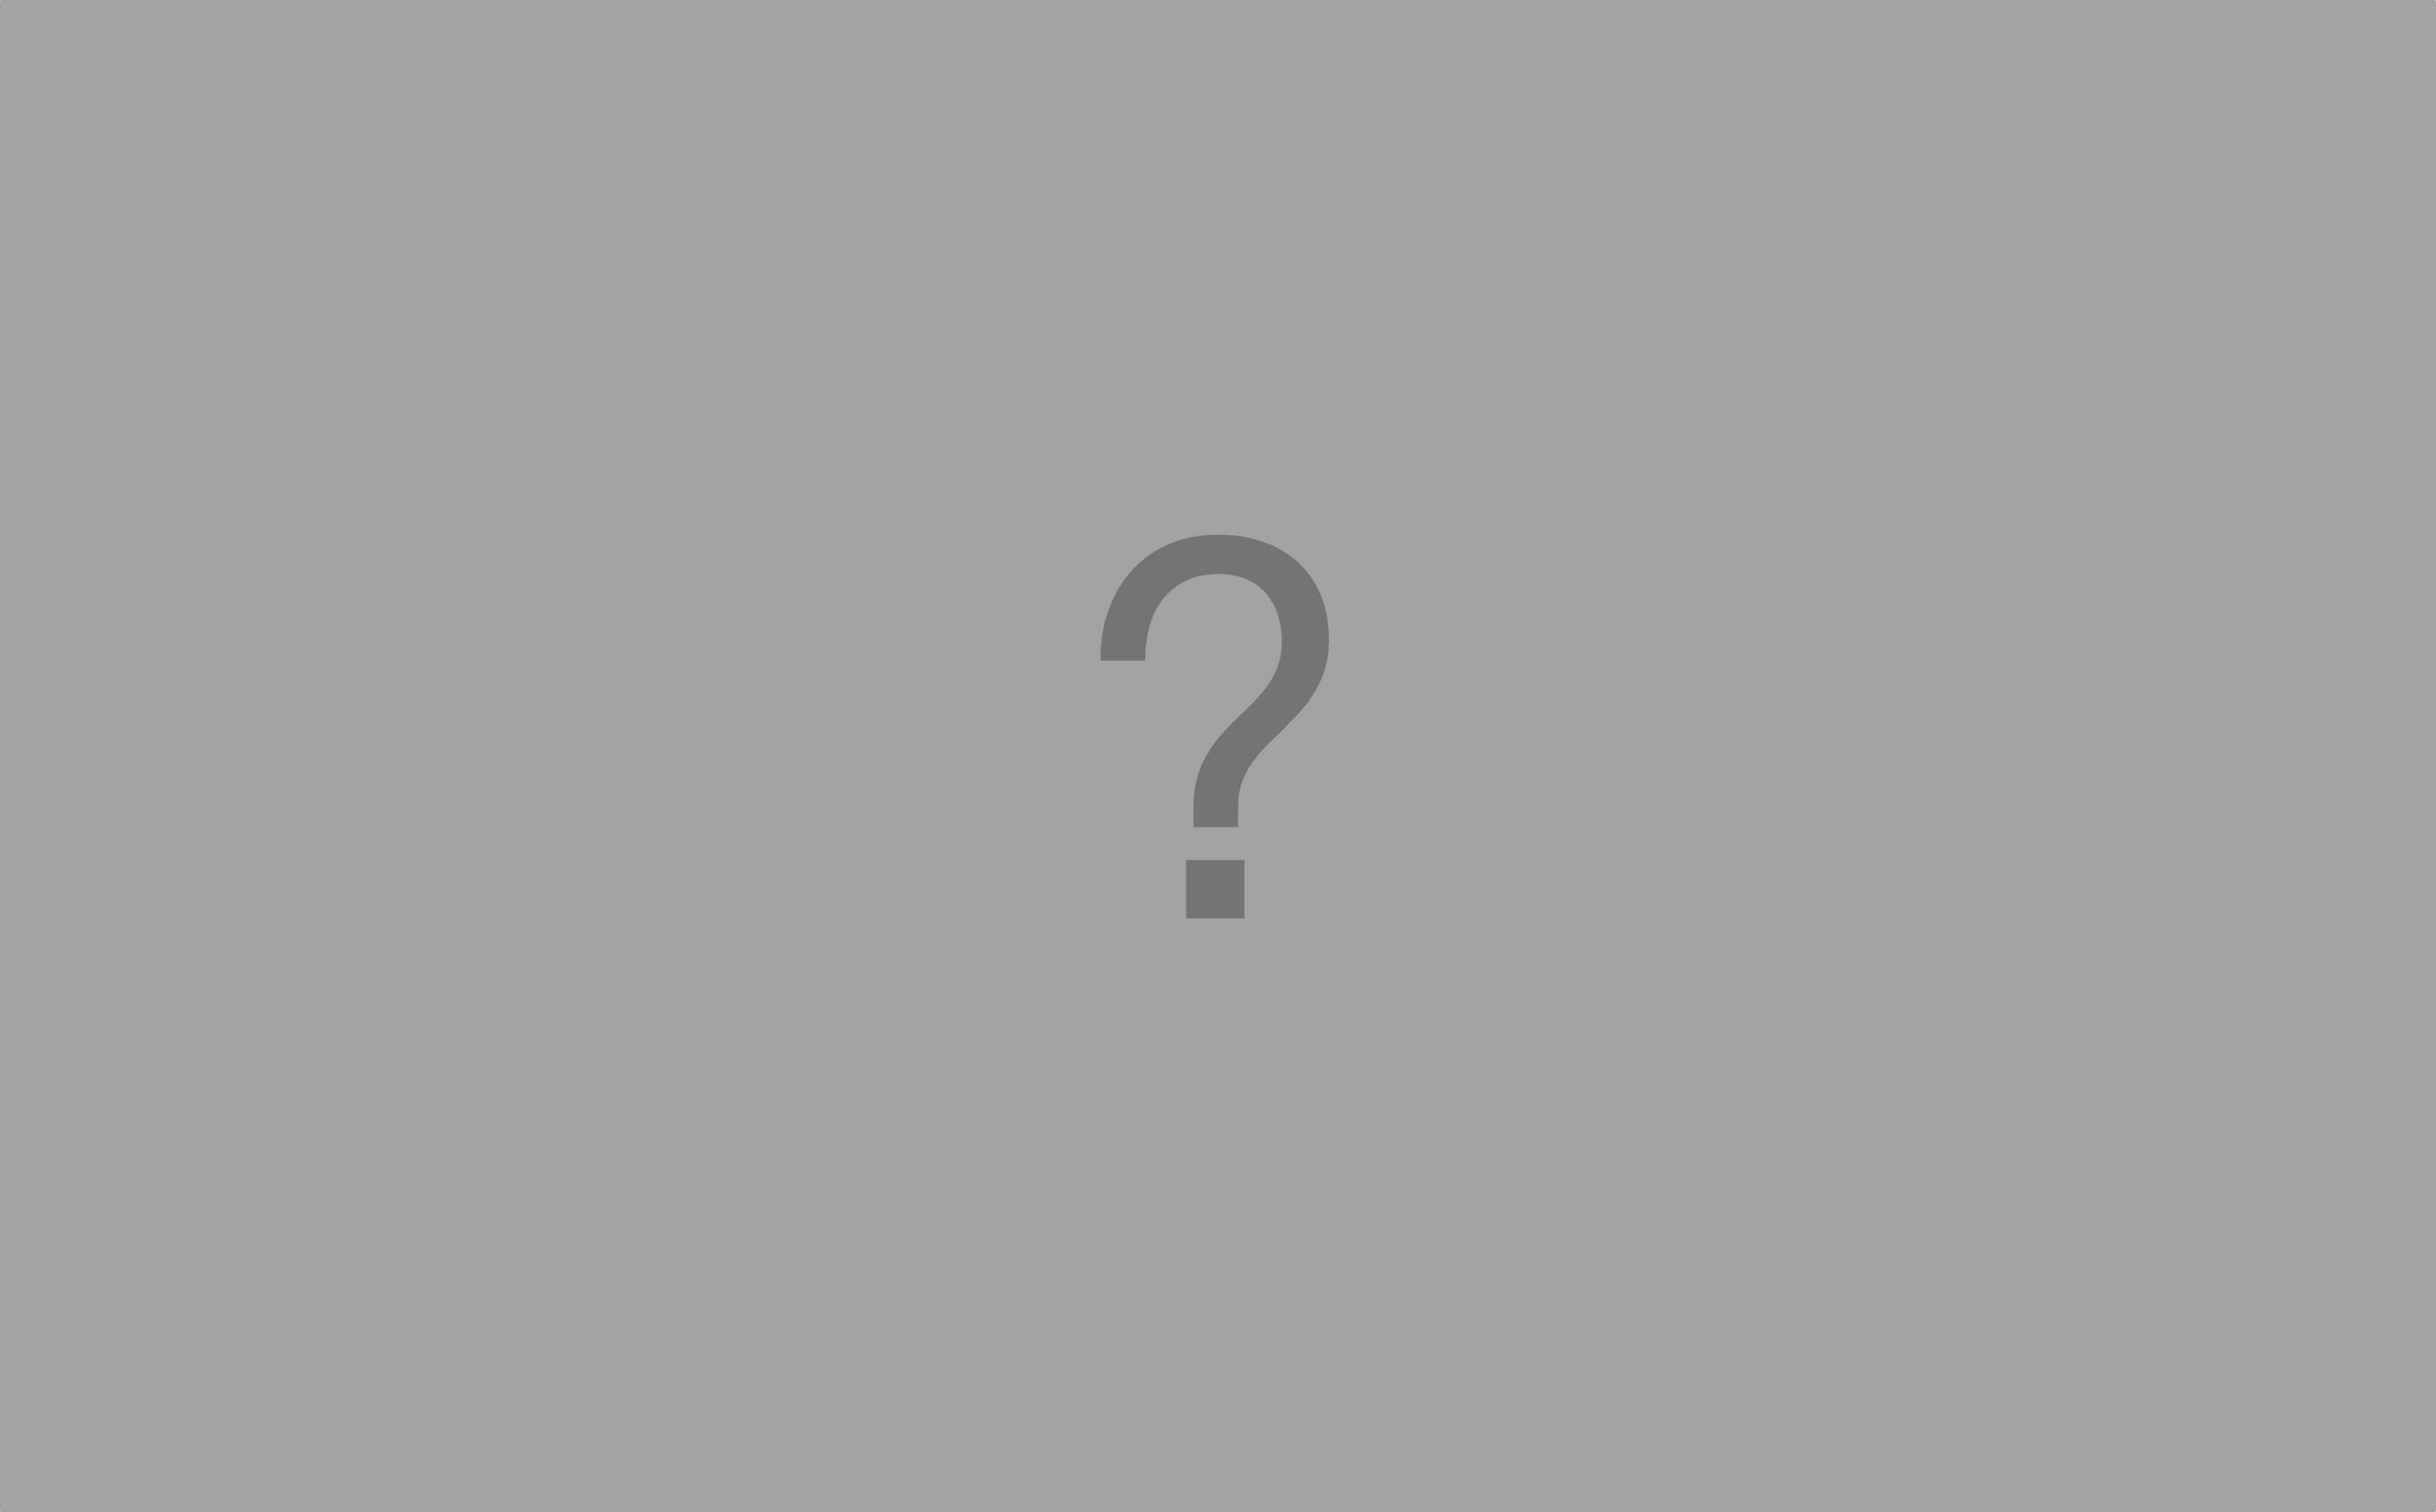 Spannend: iPhone SE 2 soll bald kommen